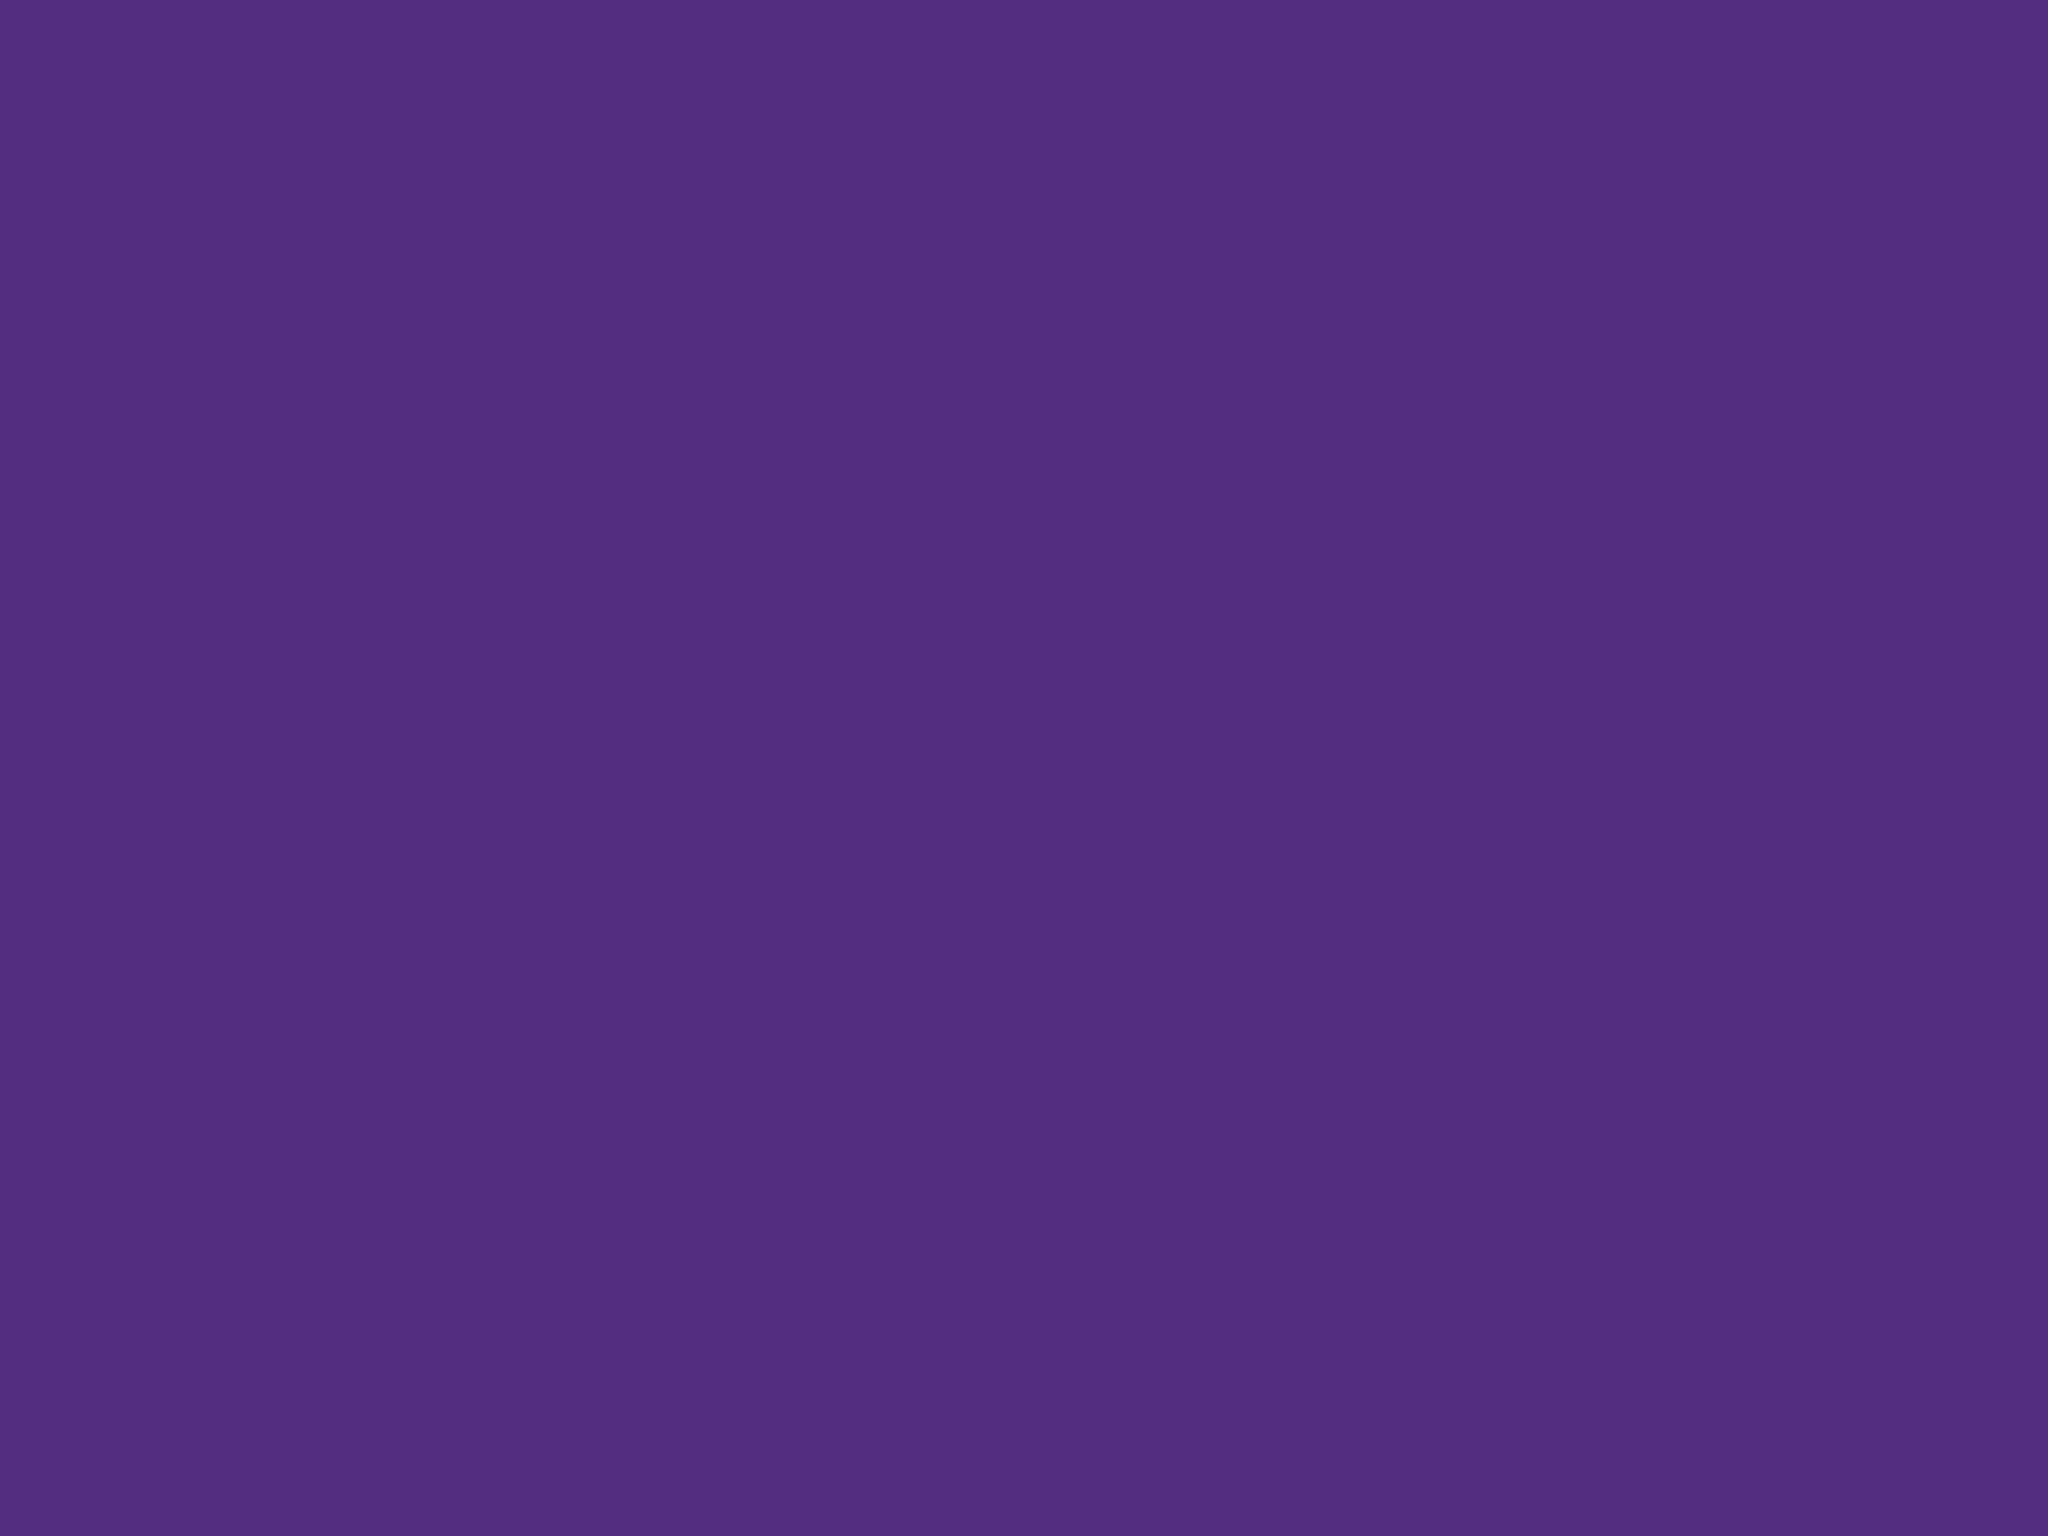 2048x1536 Regalia Solid Color Background